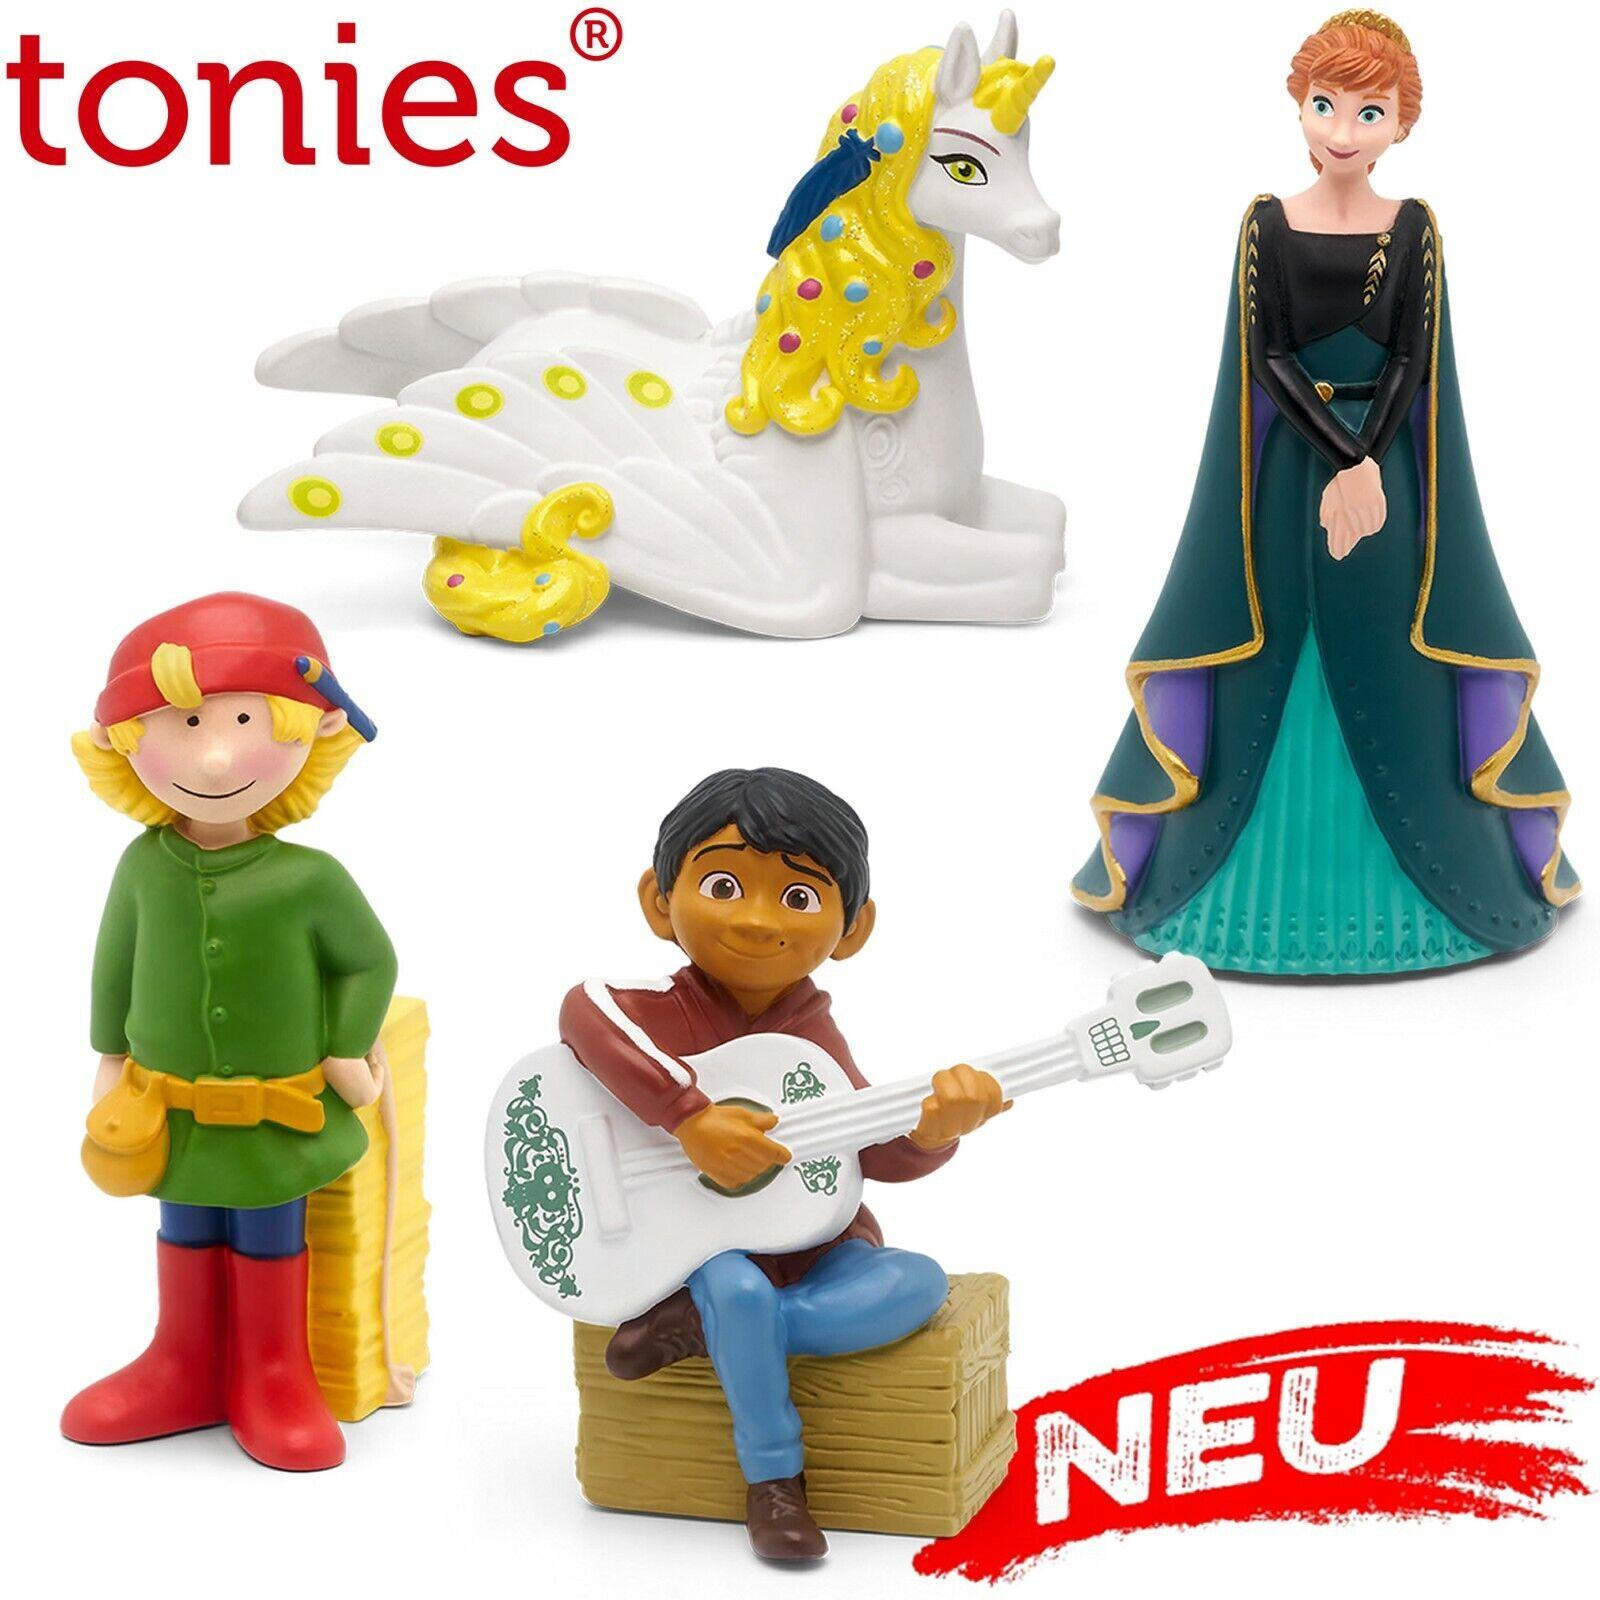 Tonies Tonie Figur Hörfigur Neuheiten Coco Frozen Anna Mia and Me Vorverkauf